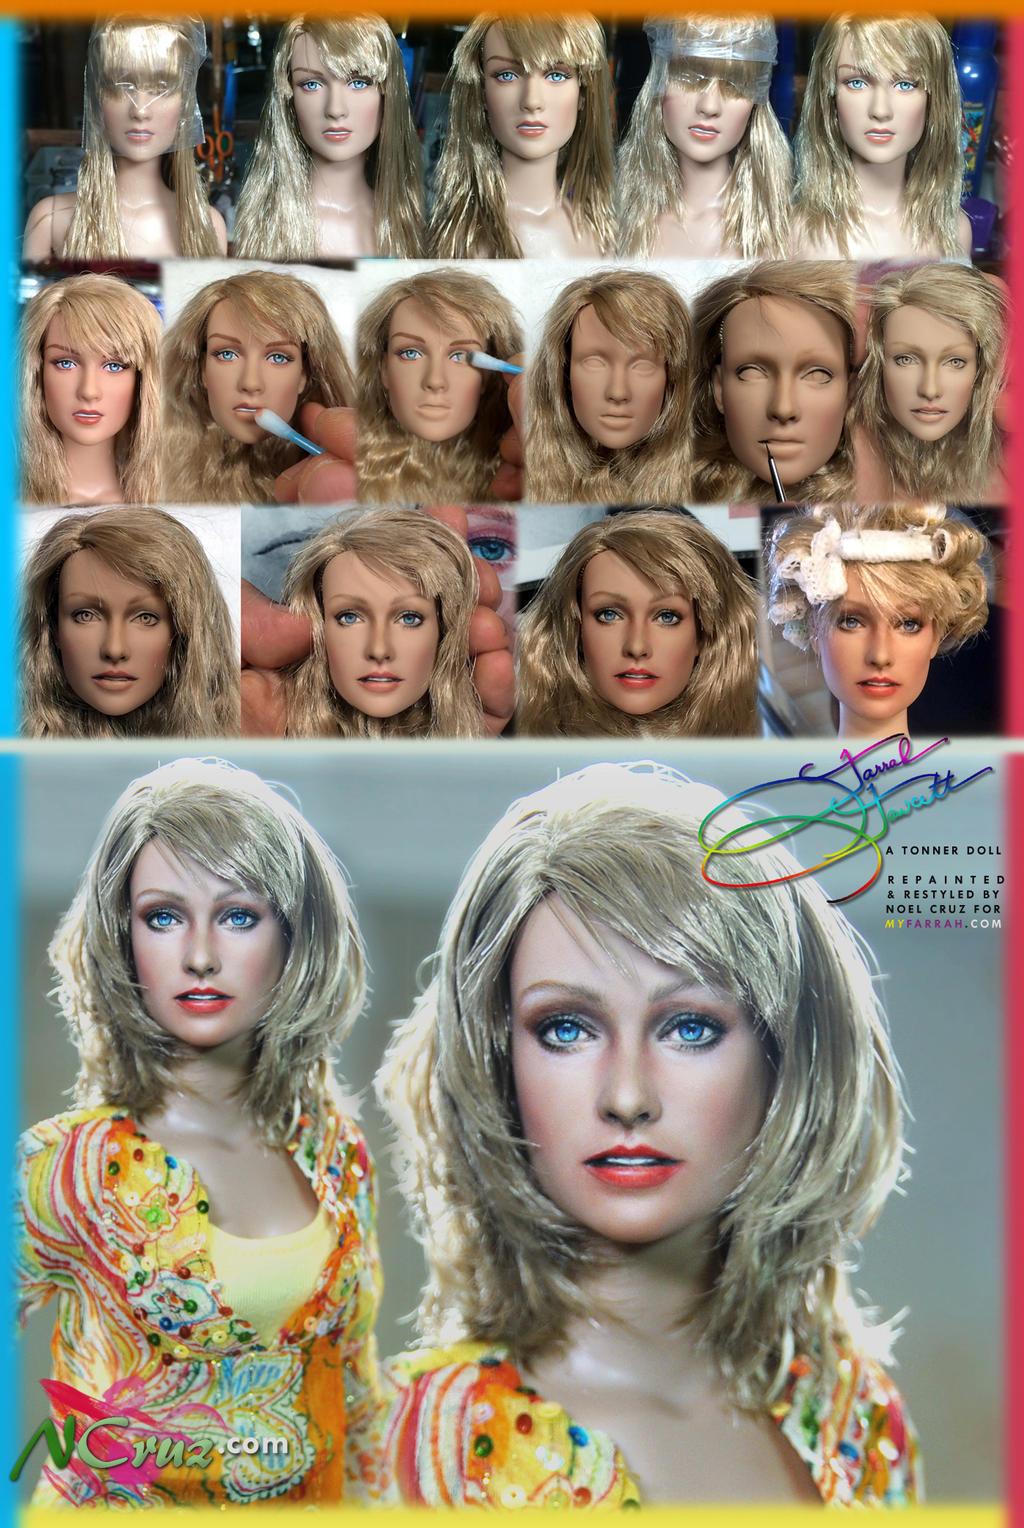 TRANSFORMATION - Tonner doll as Farrah Fawcett by noeling